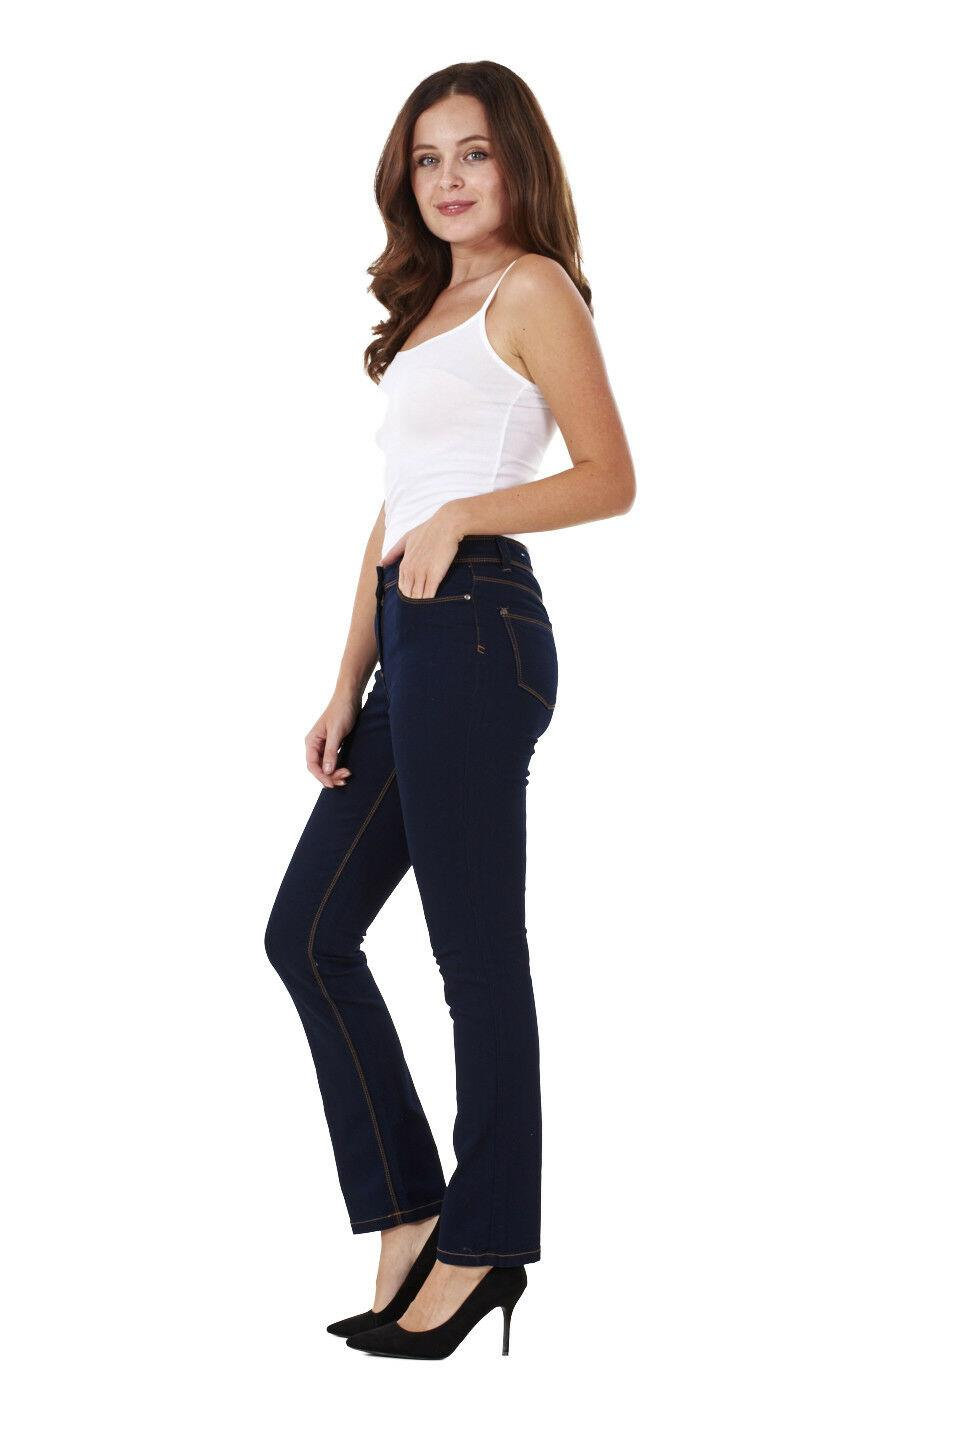 Ladies-Straight-Leg-Denim-Womens-Pants-Stretch-Regular-Fit-Jeans thumbnail 20